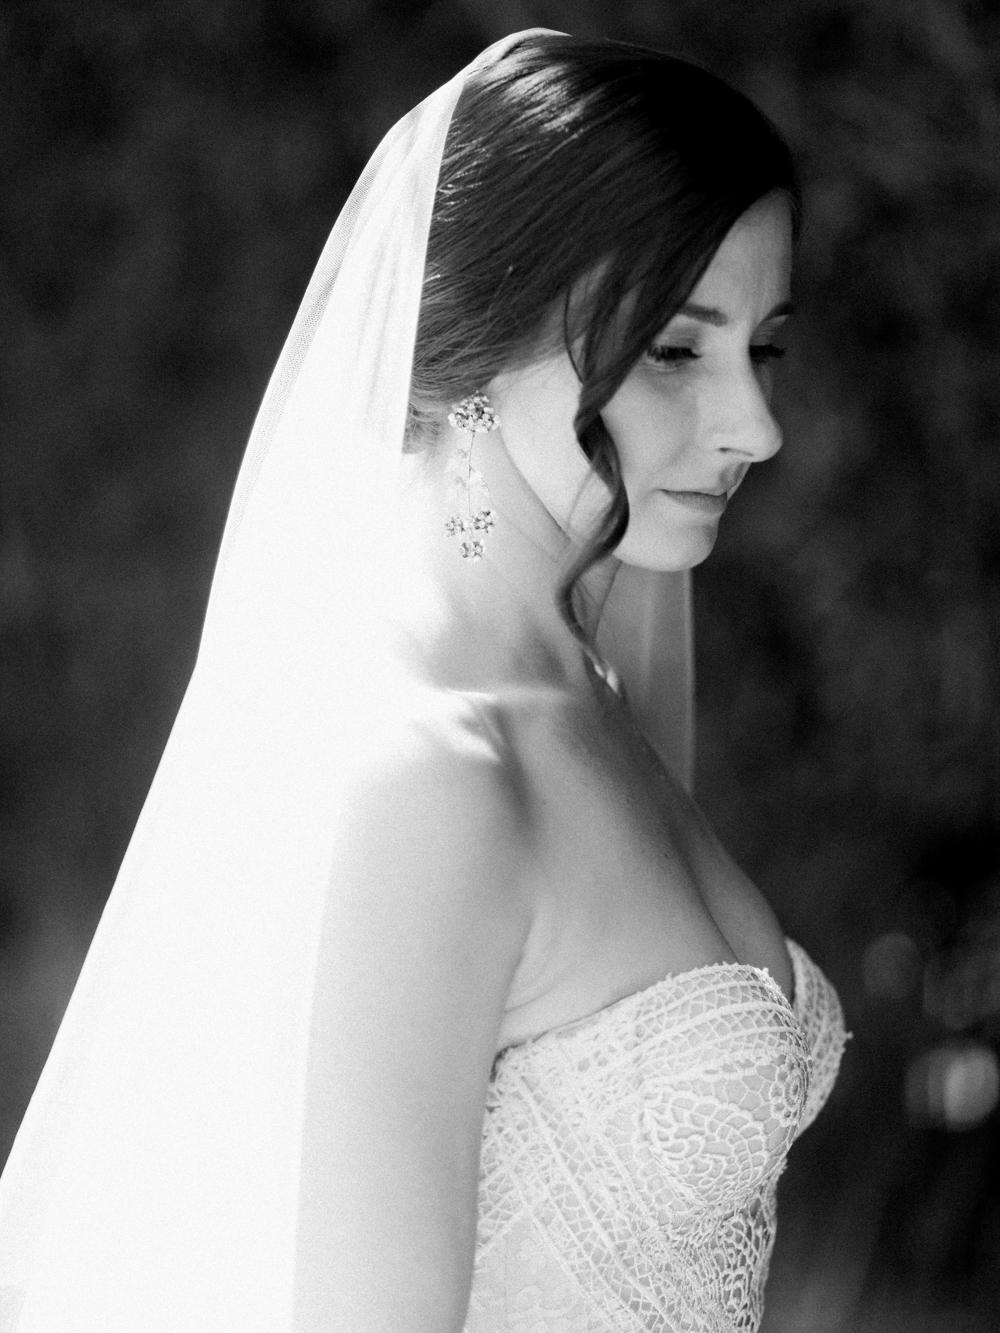 fall wedding at rothko chapel- houston wedding photographer-christine gosch - film photographer - elopement photographer- intimate wedding - lovely bride wedding gown-2.jpg